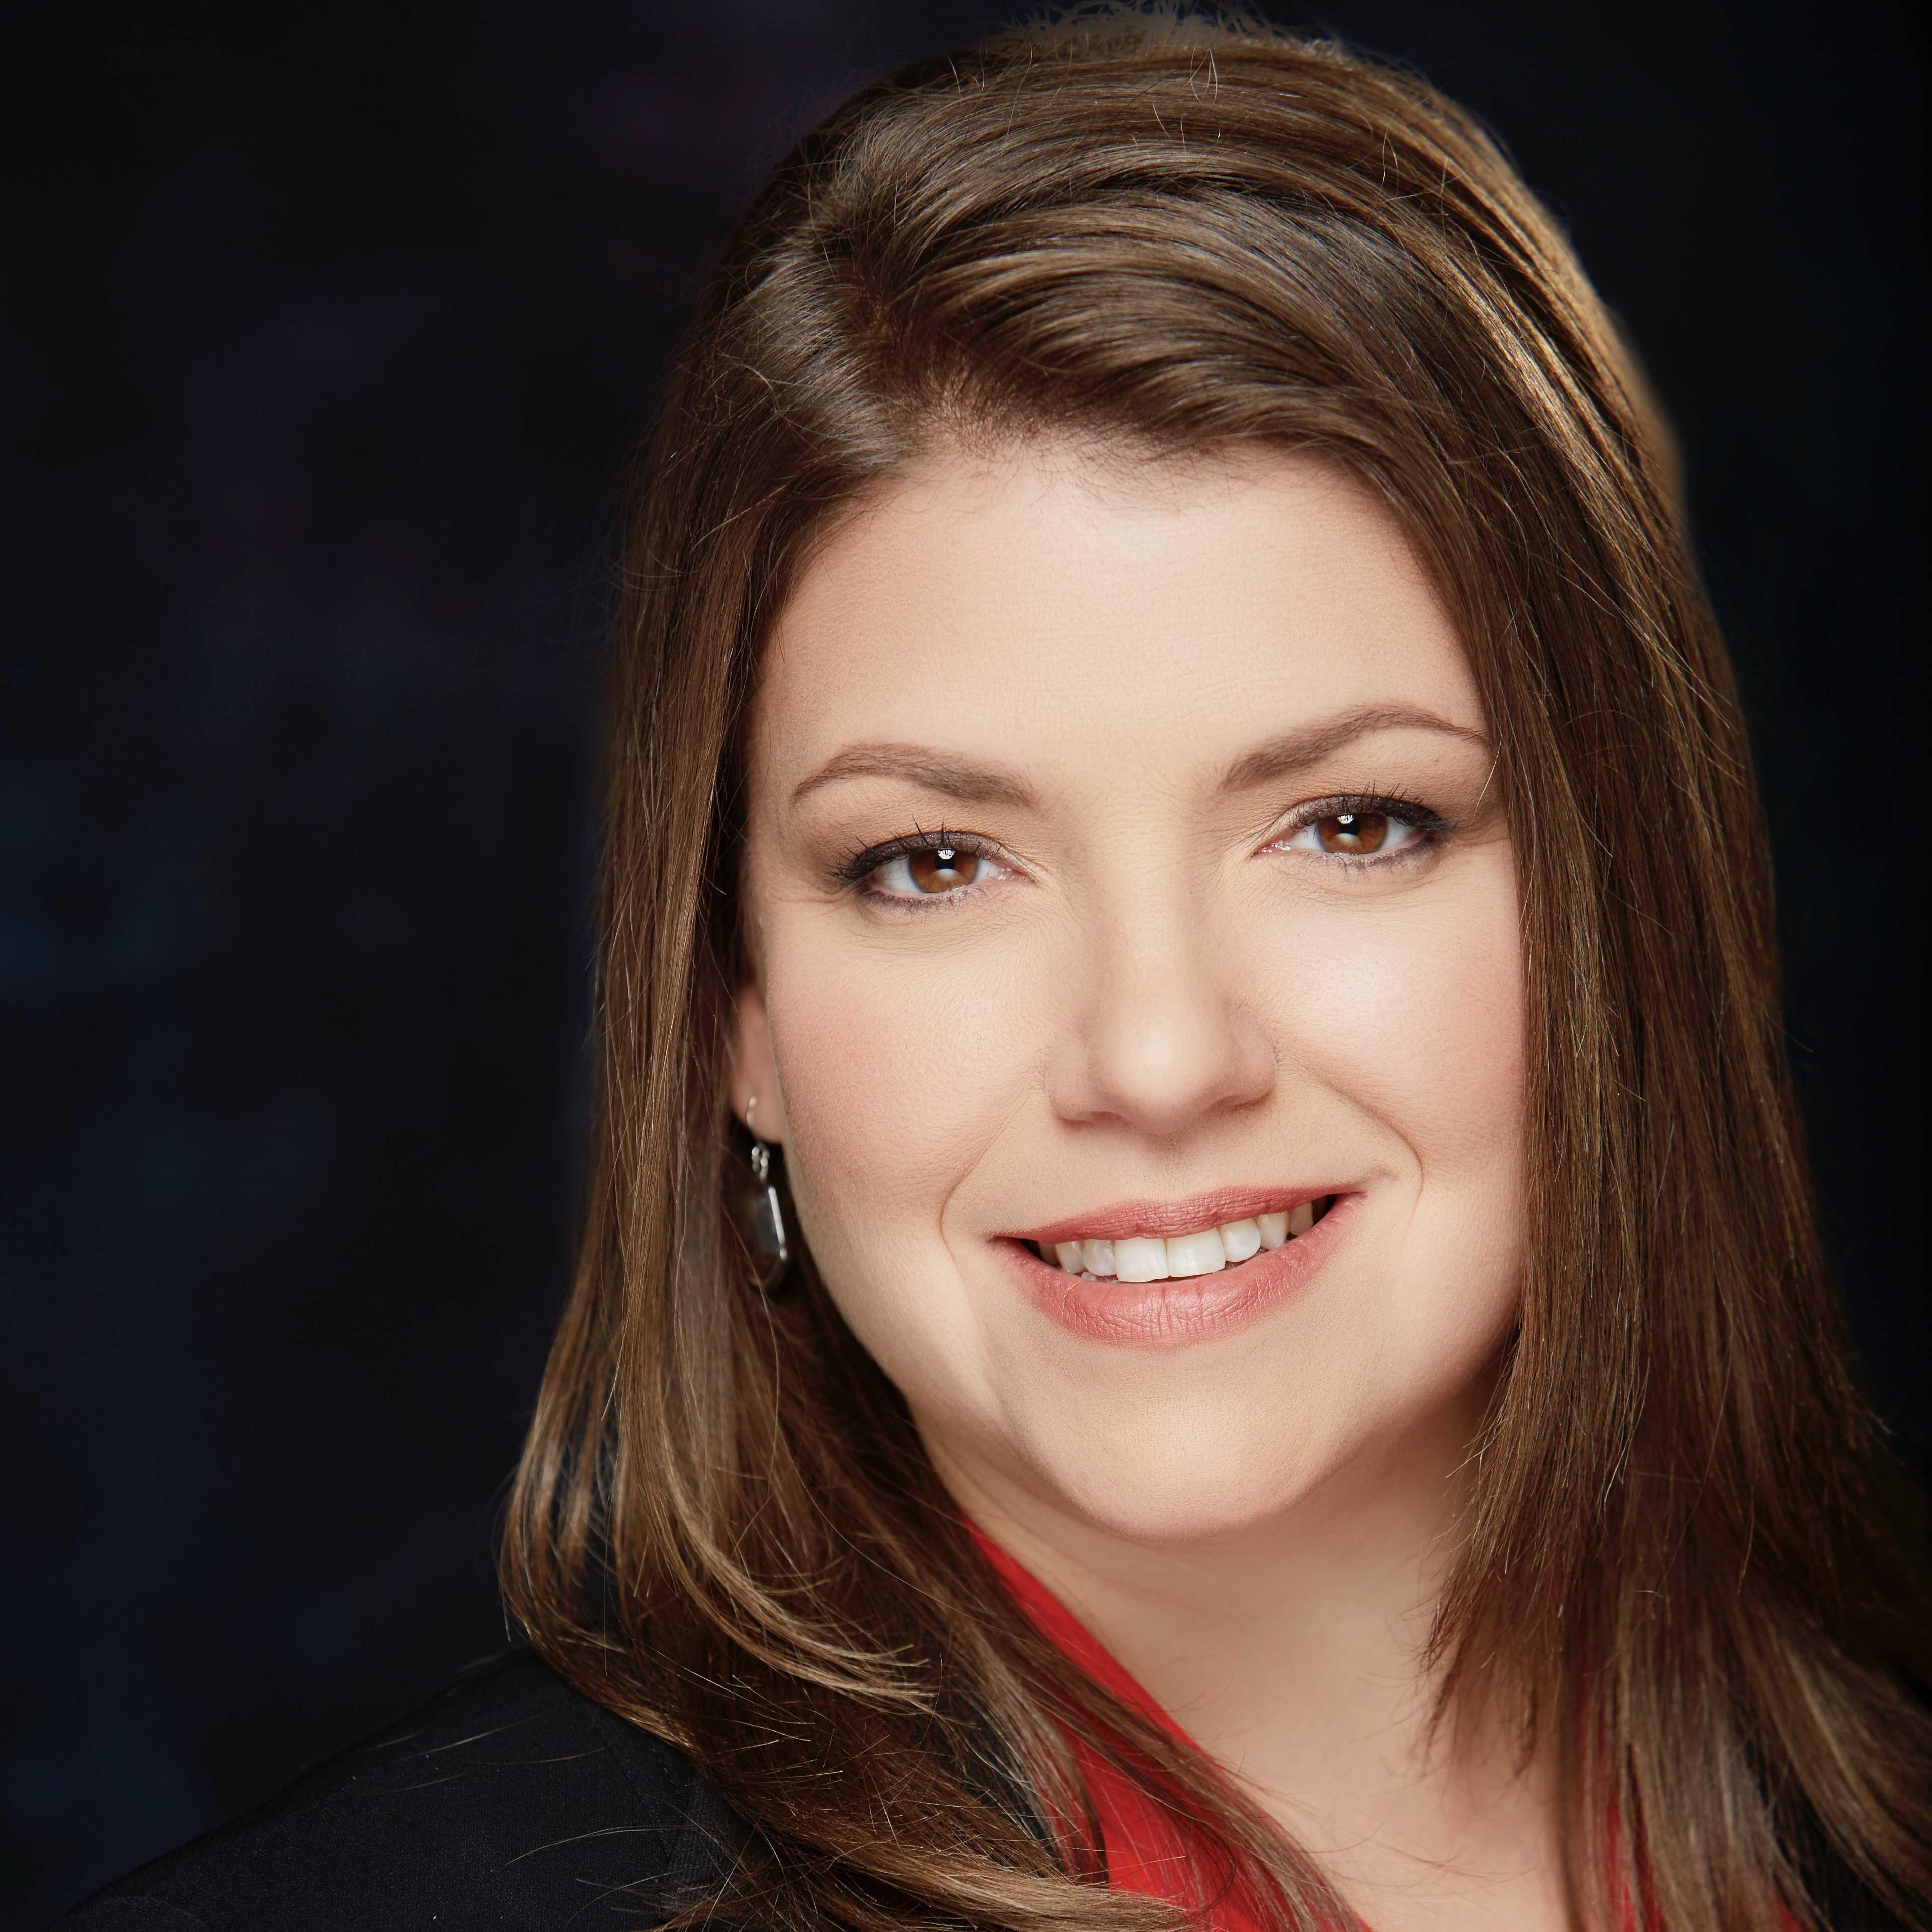 A headshot of psychologist Marla Deibler